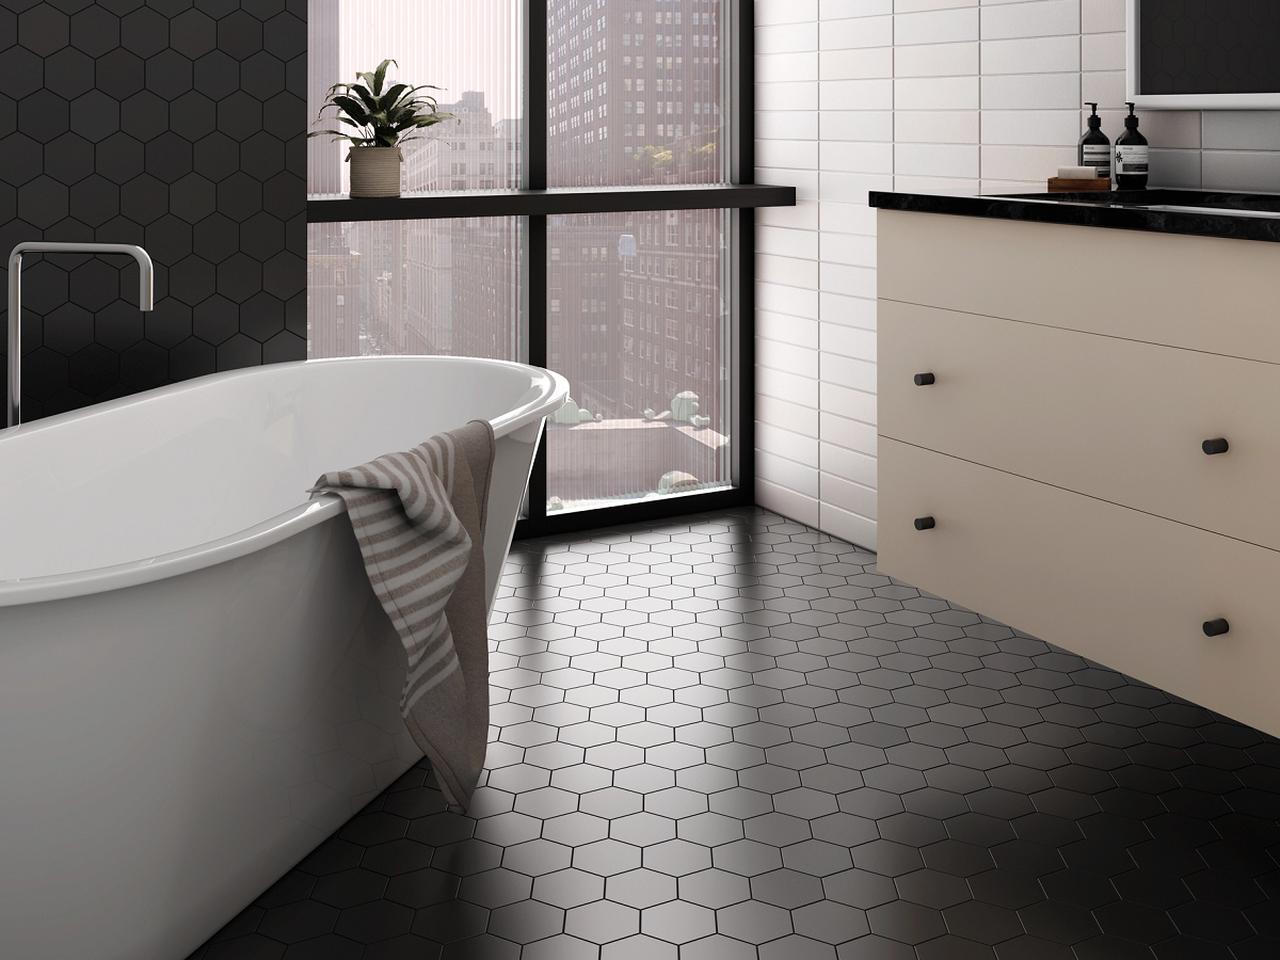 Kromatika 5 X 4 Black Matte Finish Hexagon Porcelain Floor Wall Tile 5 97 Per Square Foot In 2020 Black Tile Bathrooms Bathroom Inspiration Tile Bathroom